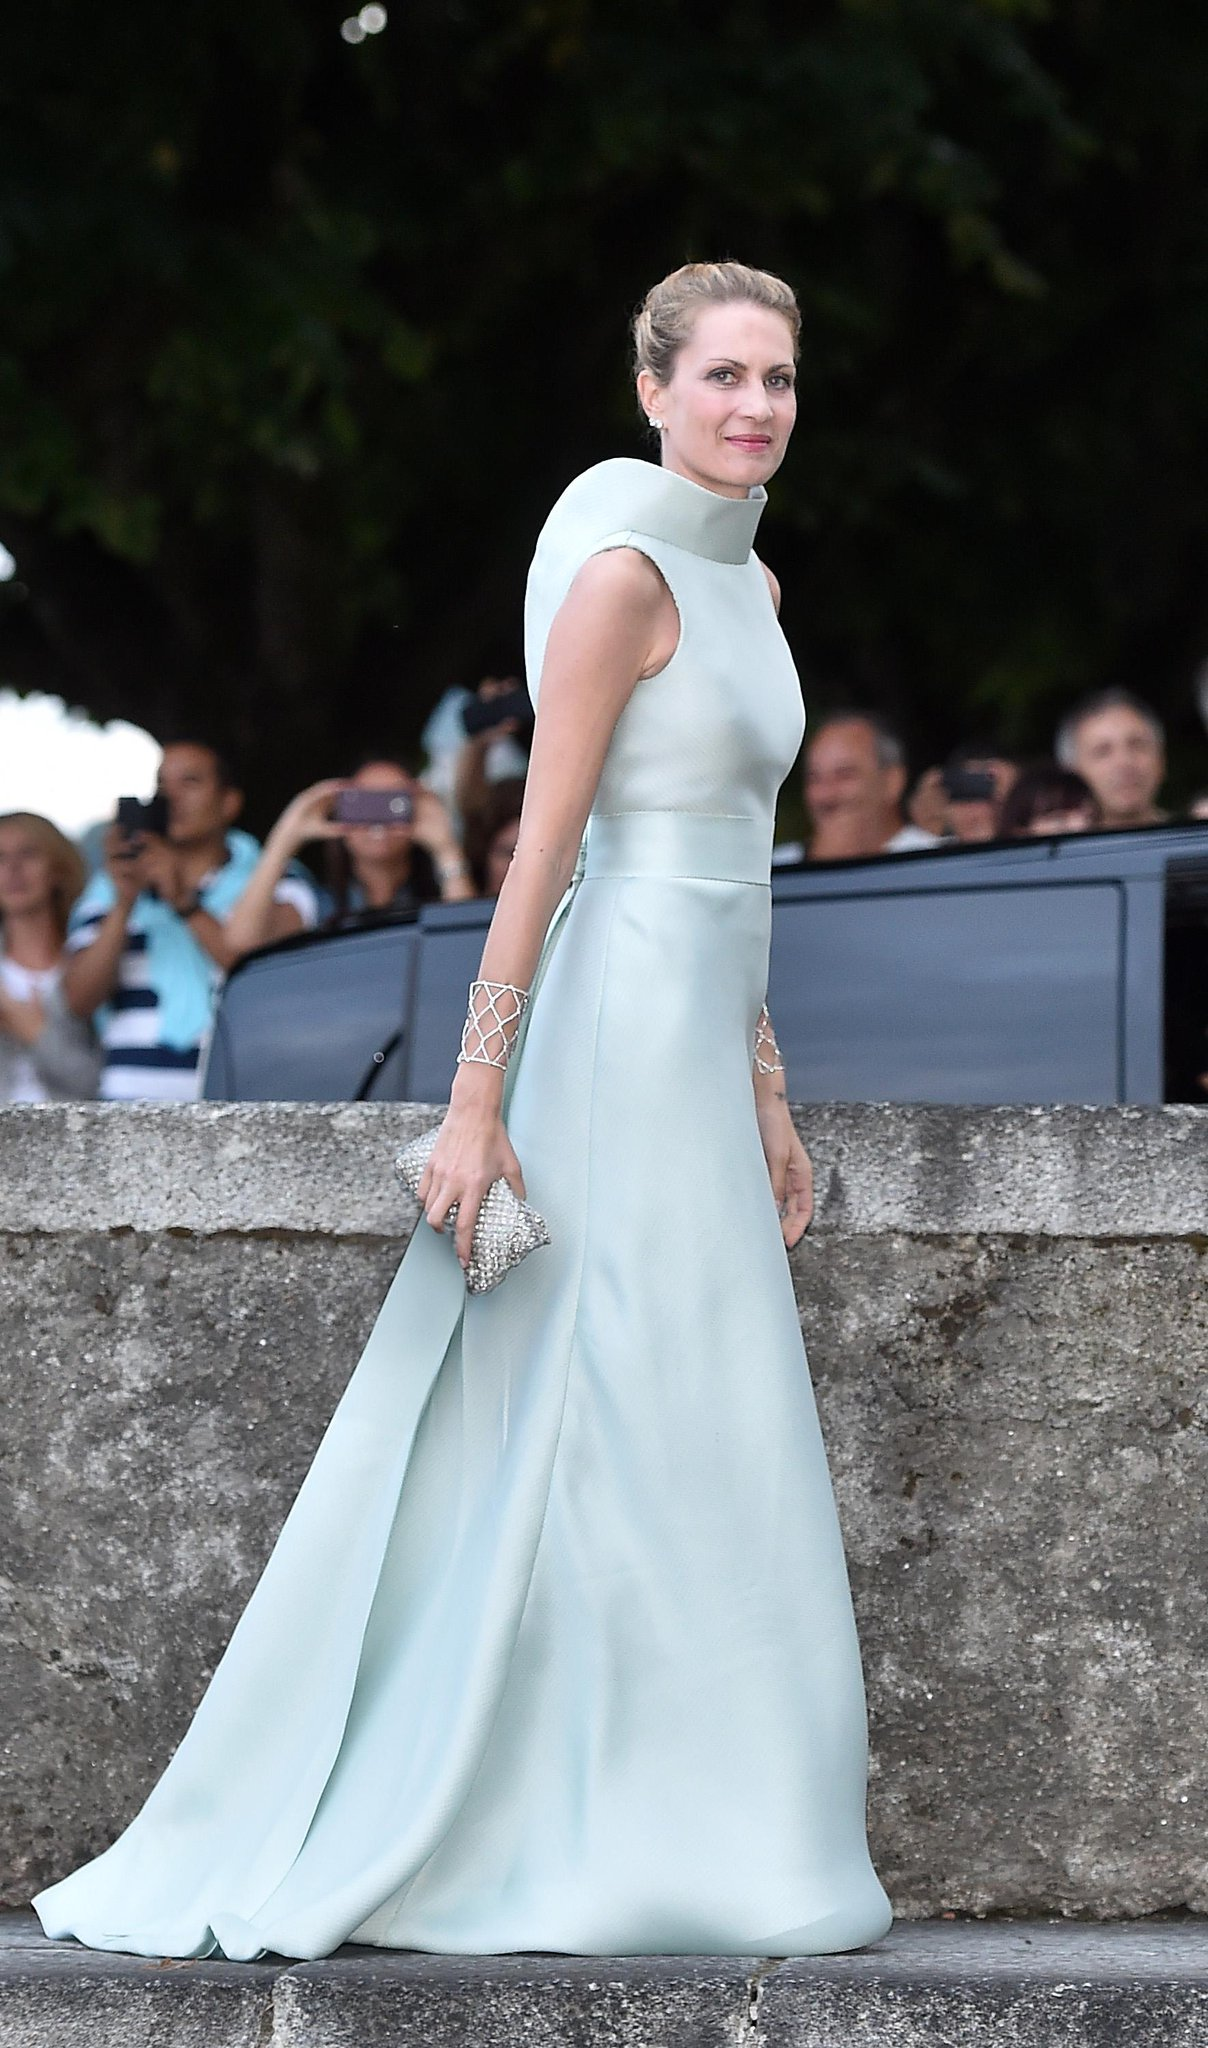 Unique Mary Wedding Dresses Mold - All Wedding Dresses ...